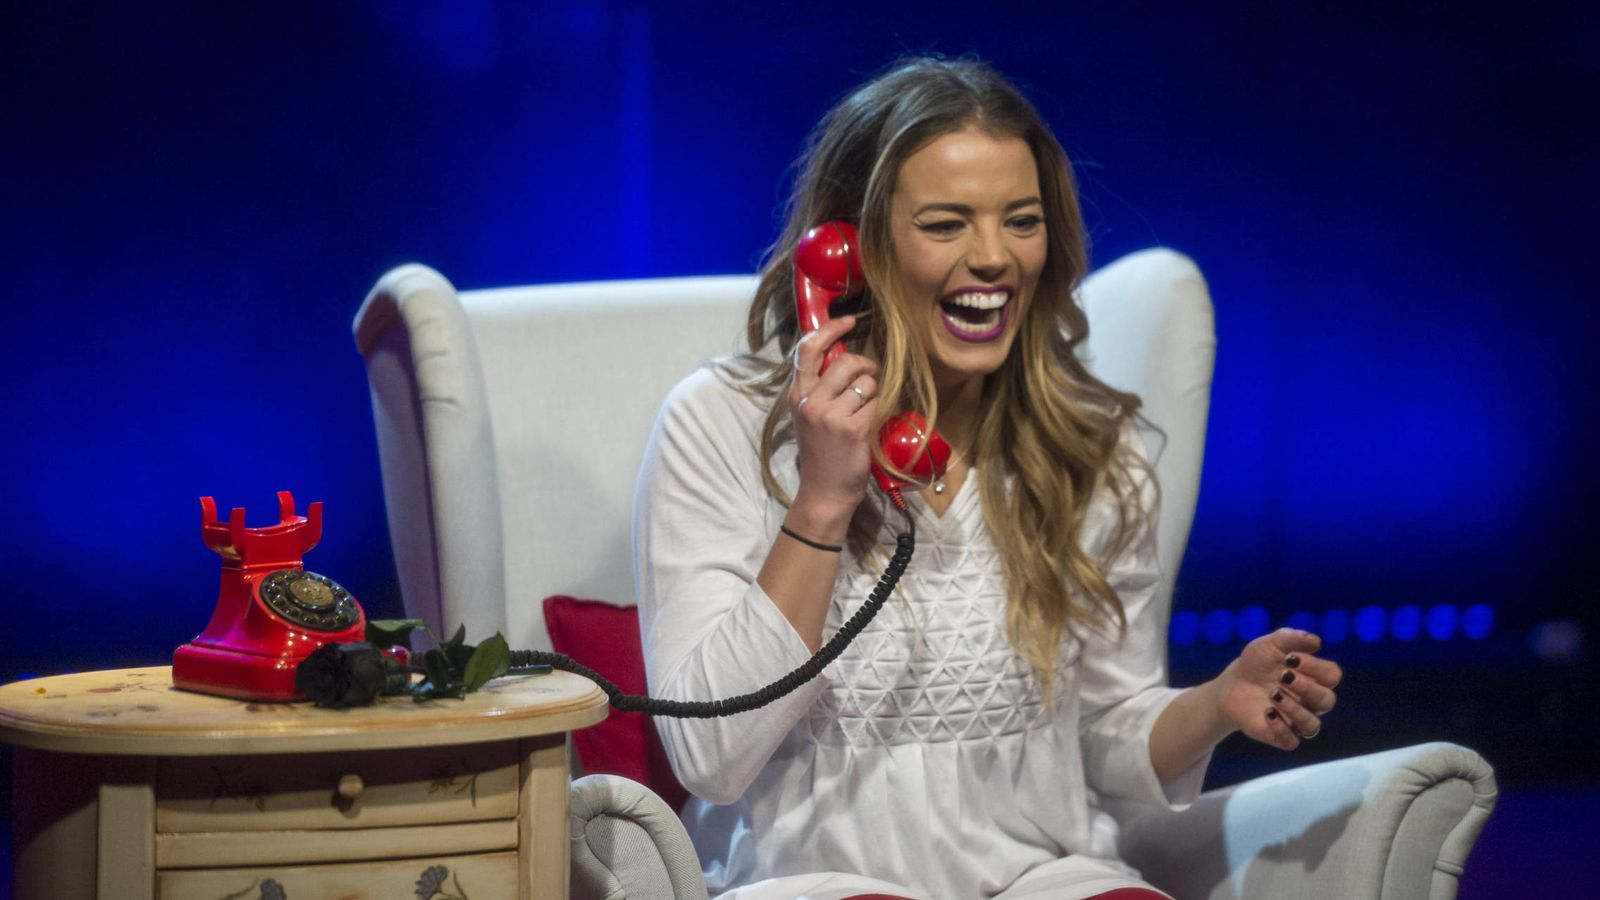 GH VIP 5: Uri Sábat, exnovio de Daniela Blume, vuelve a